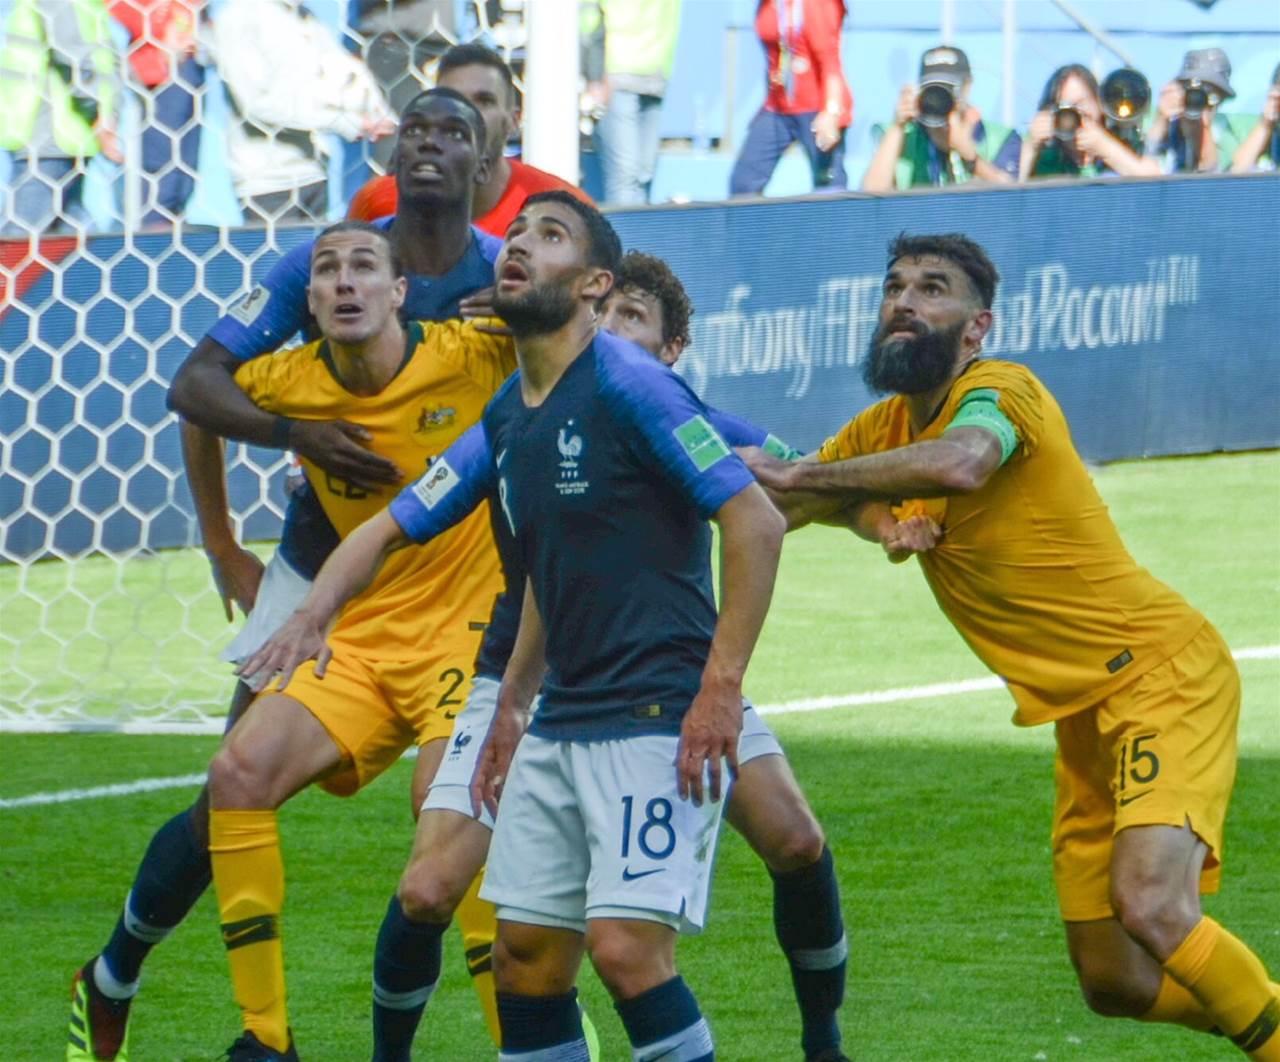 World class Socceroos